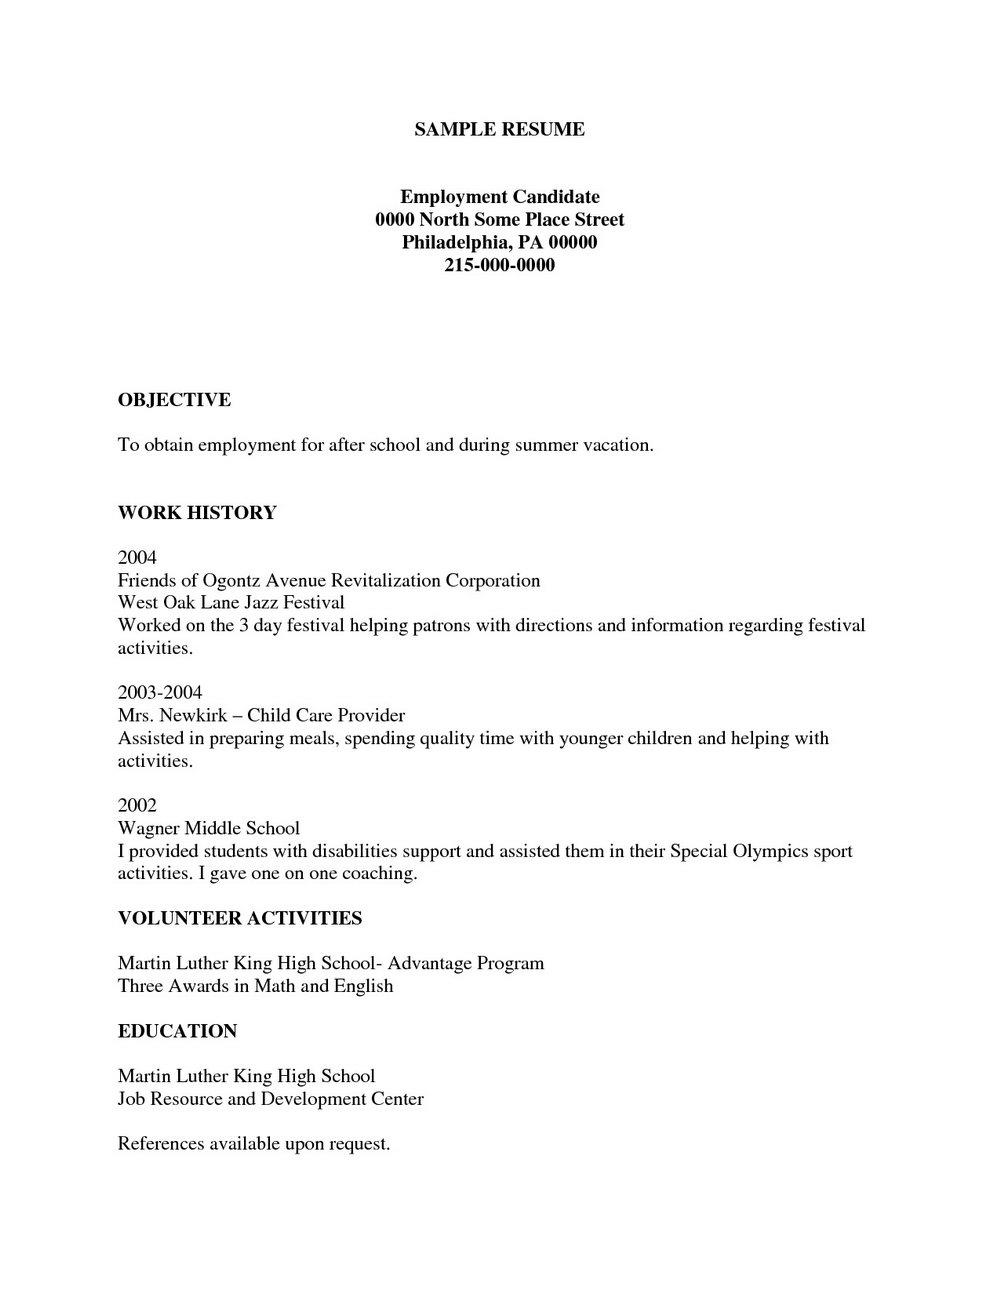 Free Online Resume Builder Reddit